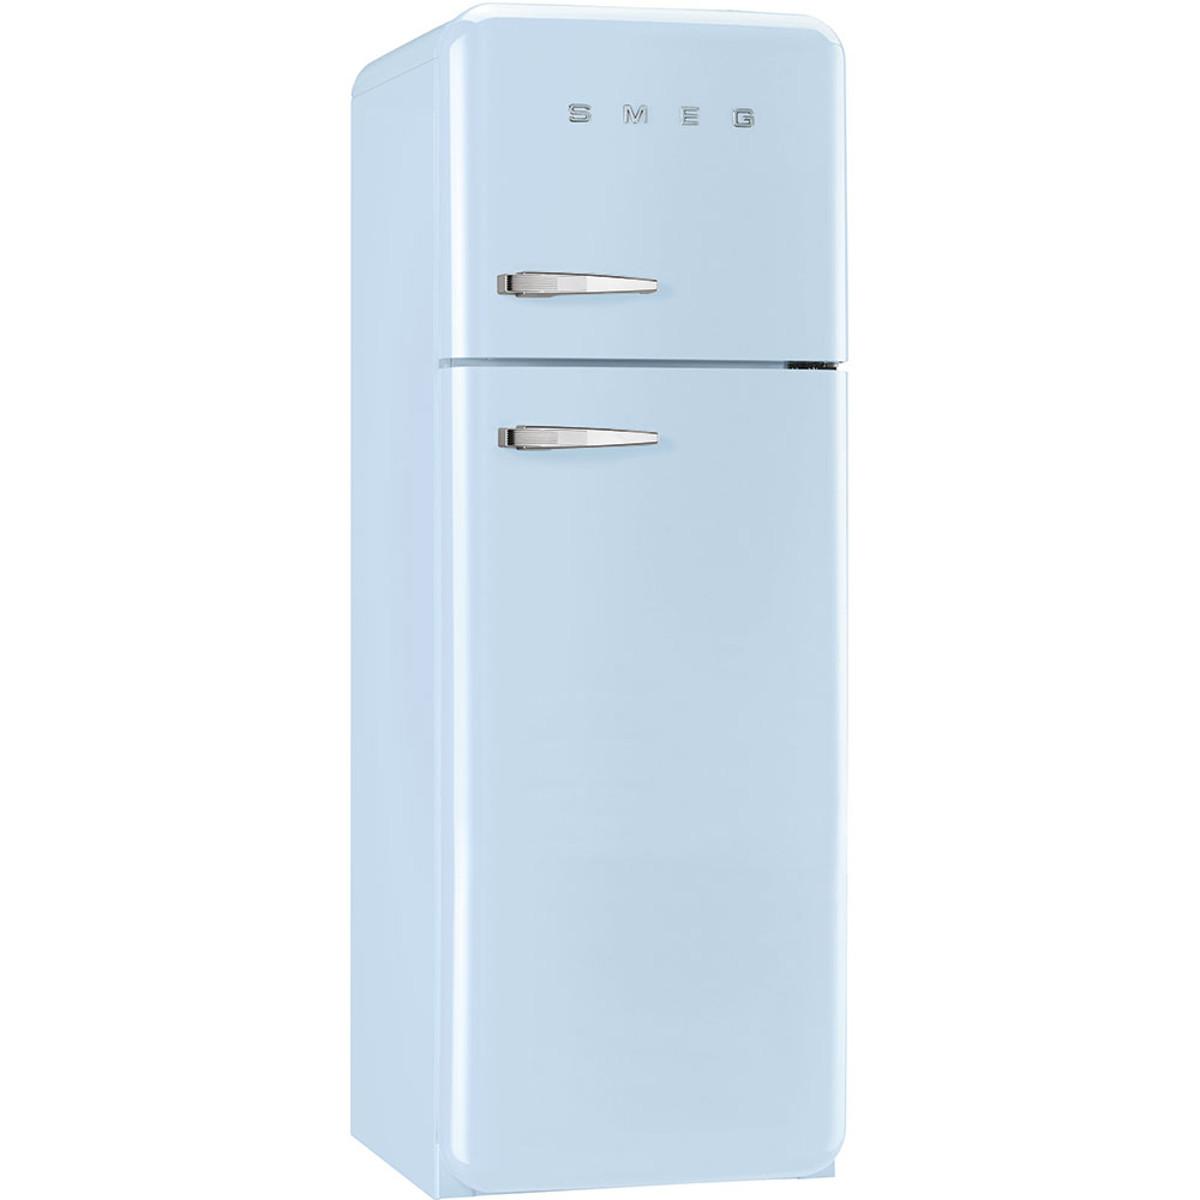 Smeg FAB30RFA 50's Style Retro Fridge Freezer – Pastel Blue